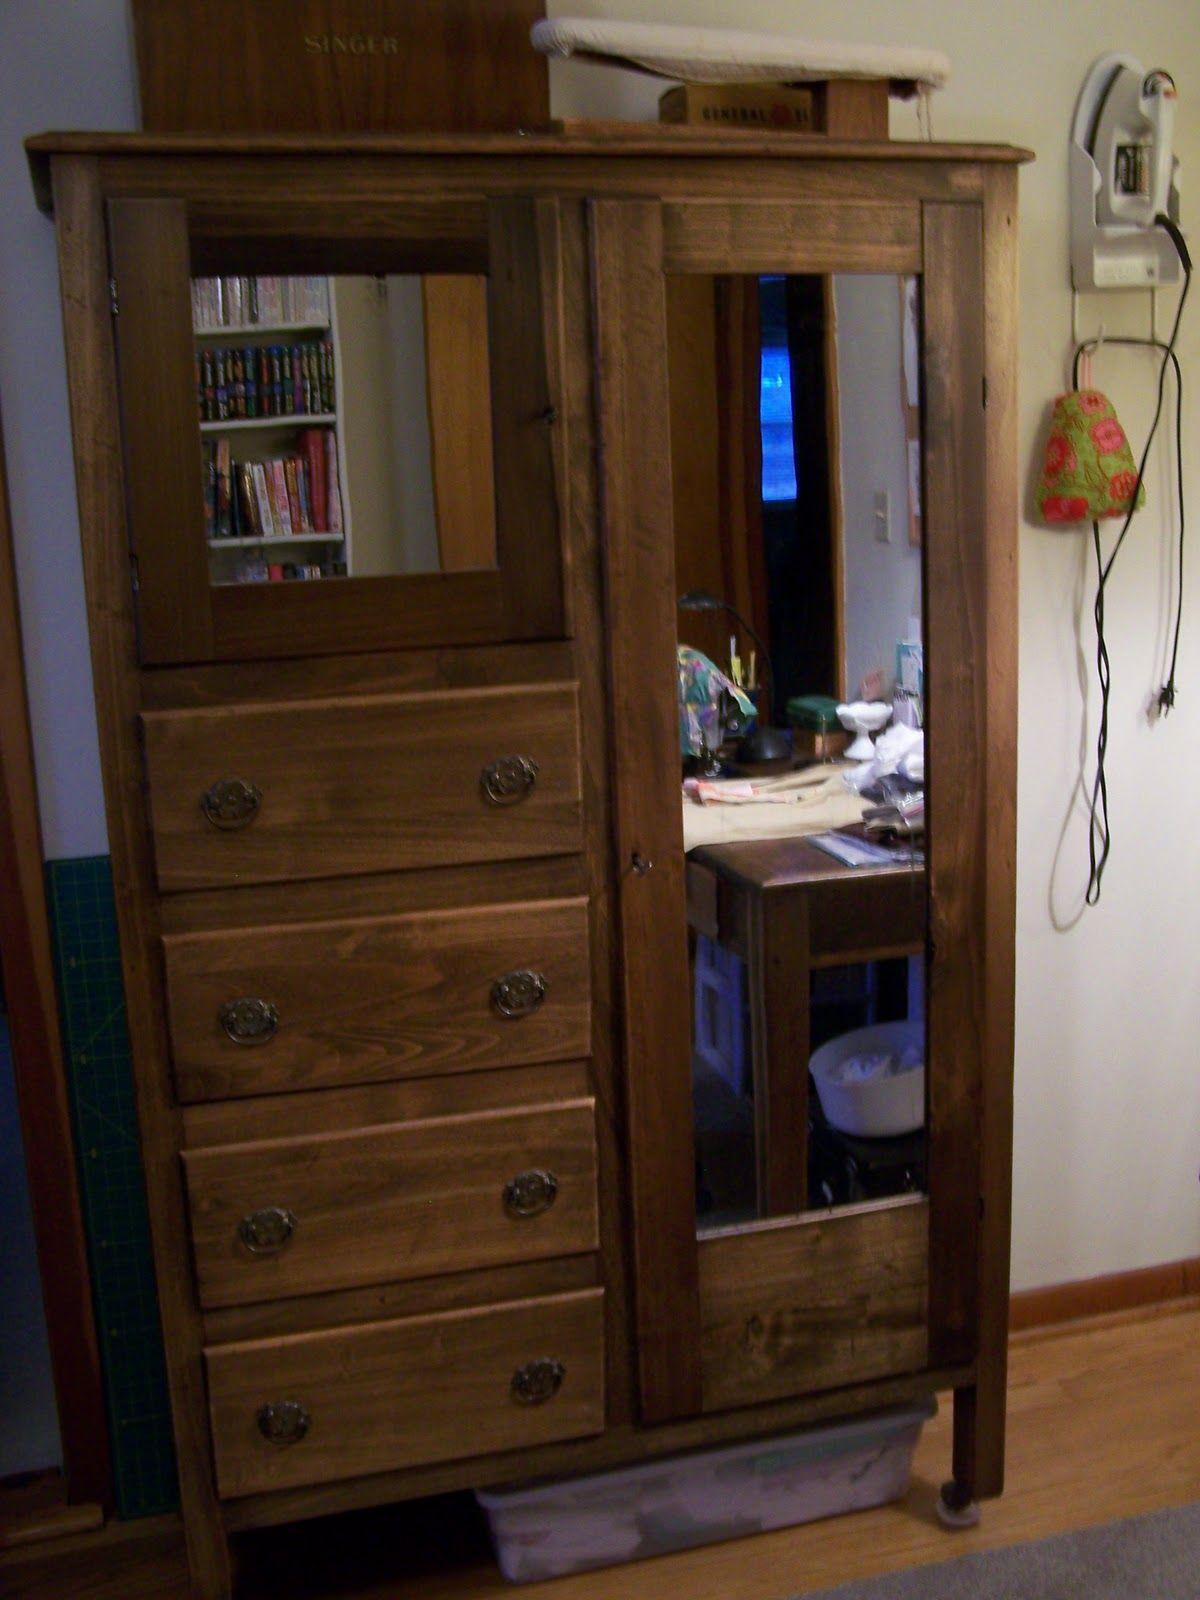 Good Looking Bedroom Furniture Design Using Antique Chifferobe With Mirror  : Handsome Bedroom Furniture Design Ideas Using Solid Wood Wardrobe  Chifferobe ... - Chifferobe 1930 - Google Search COUNTRY/FARMHOUSE/VINTAGE/RETRO